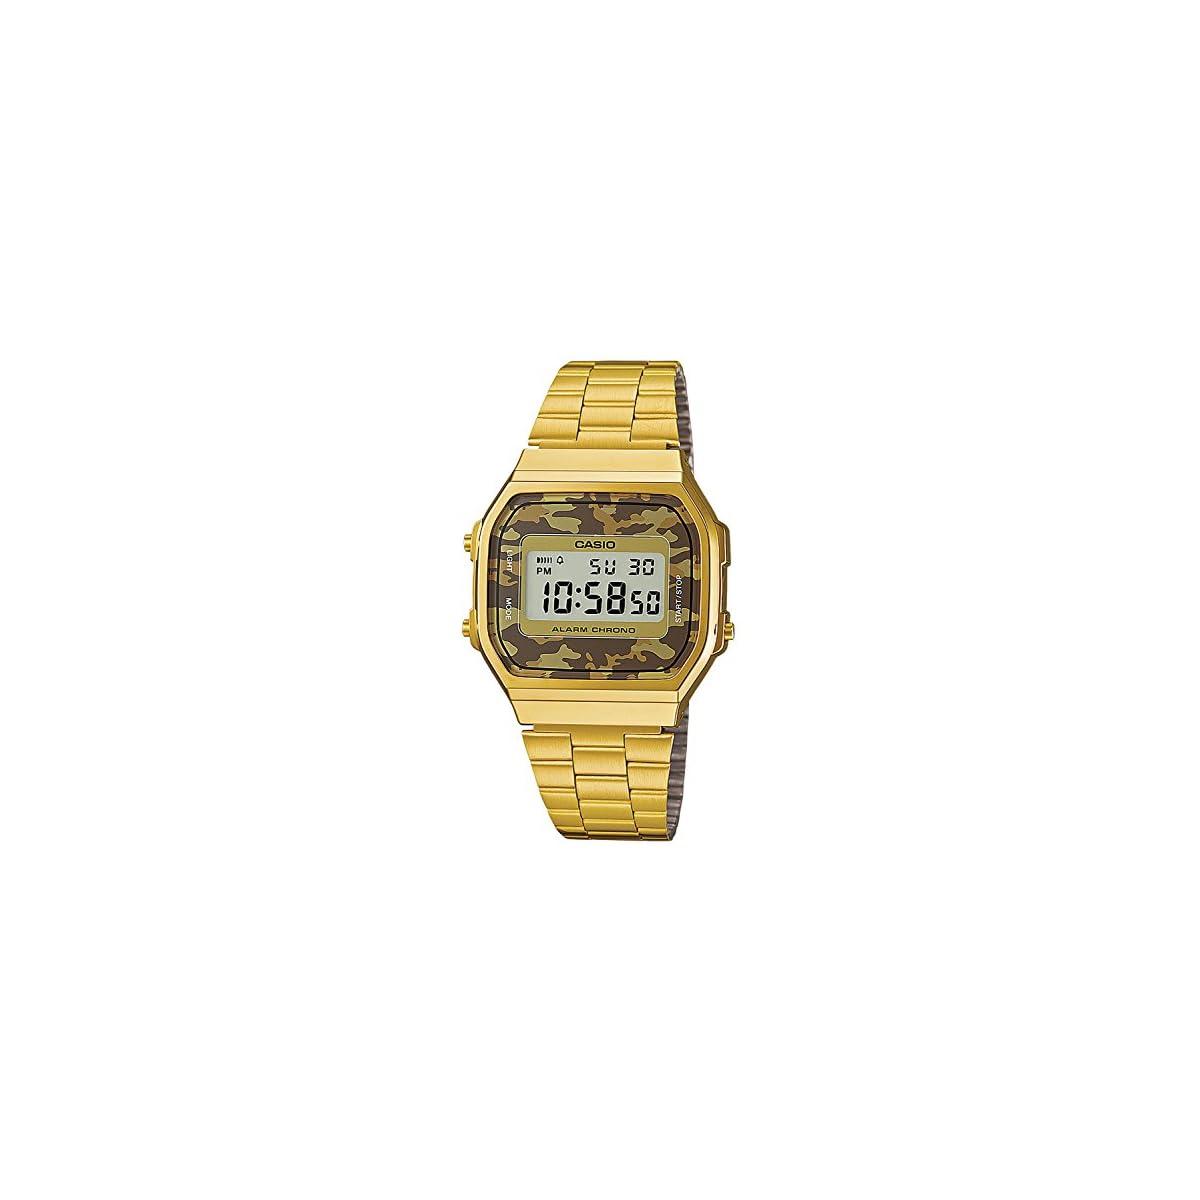 51pSMZGnigL. SS1200  - Reloj Casio Unisex